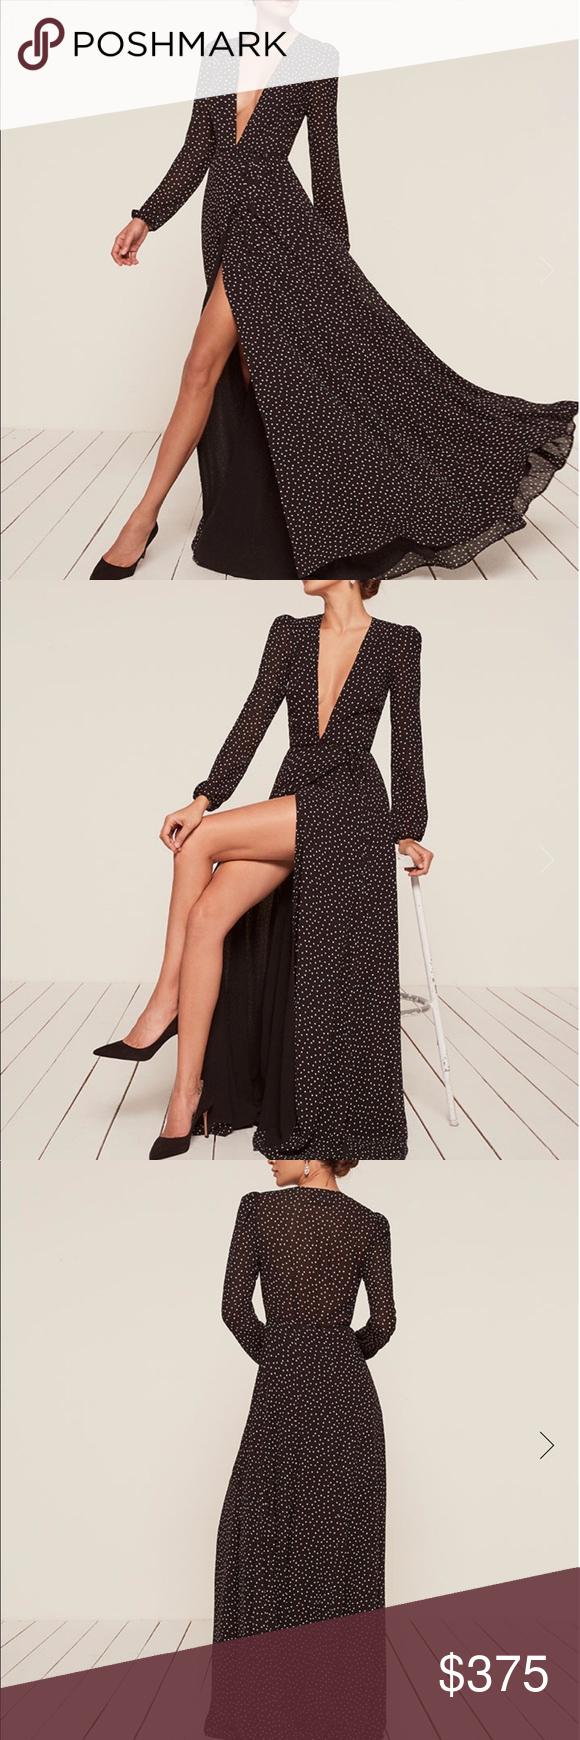 Milan dress boutique reformation wrap dresses and milan